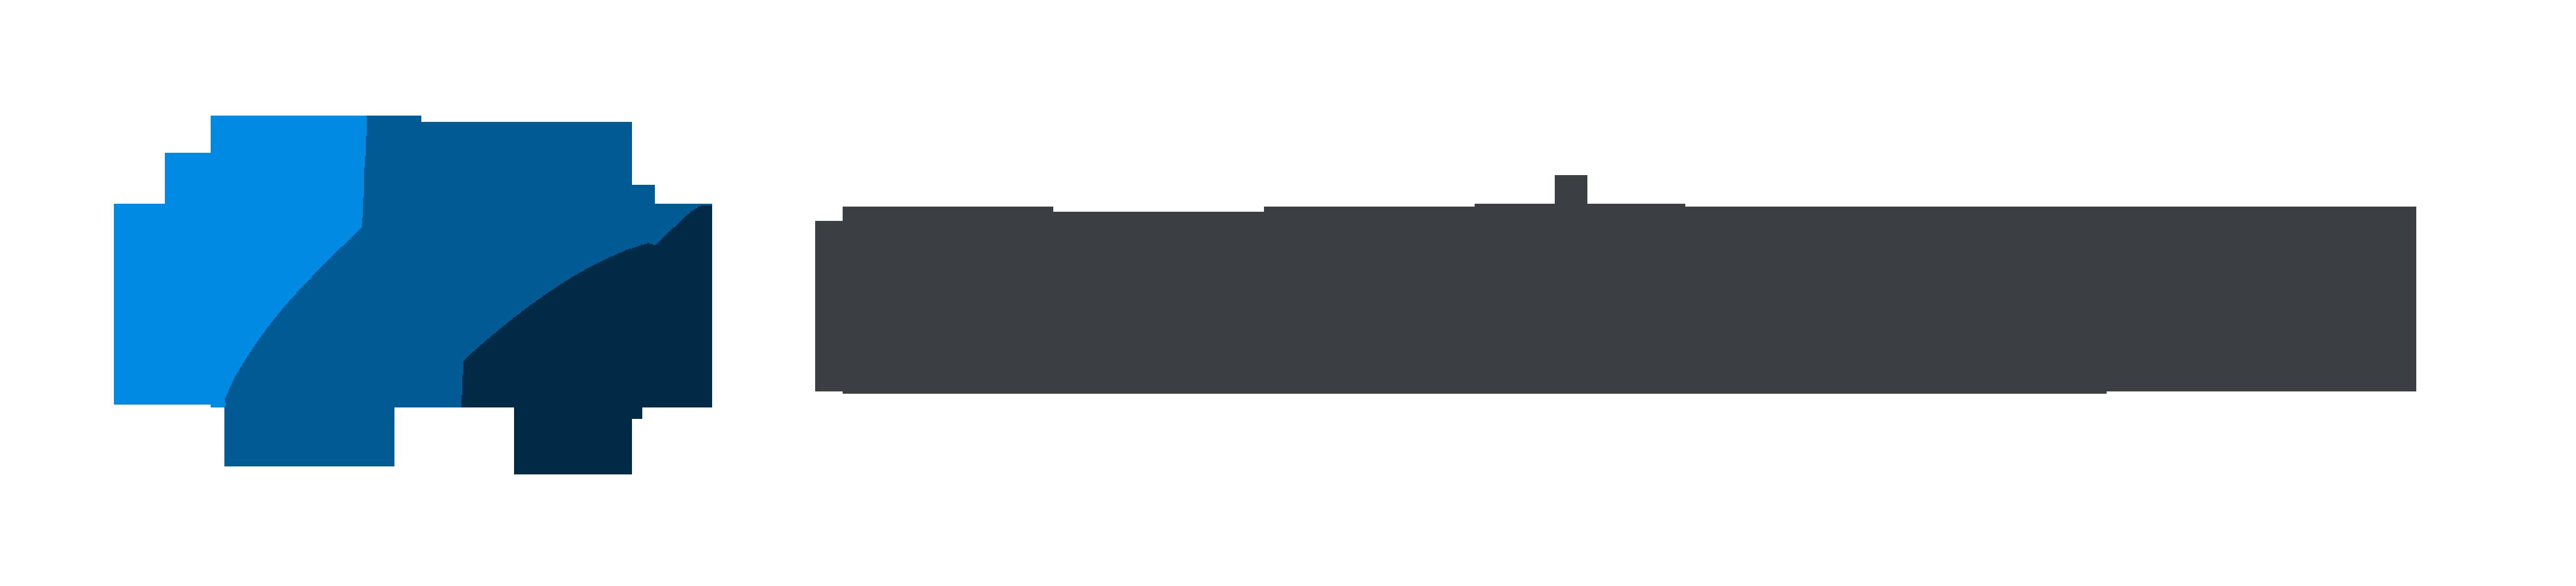 Rawstream Limited